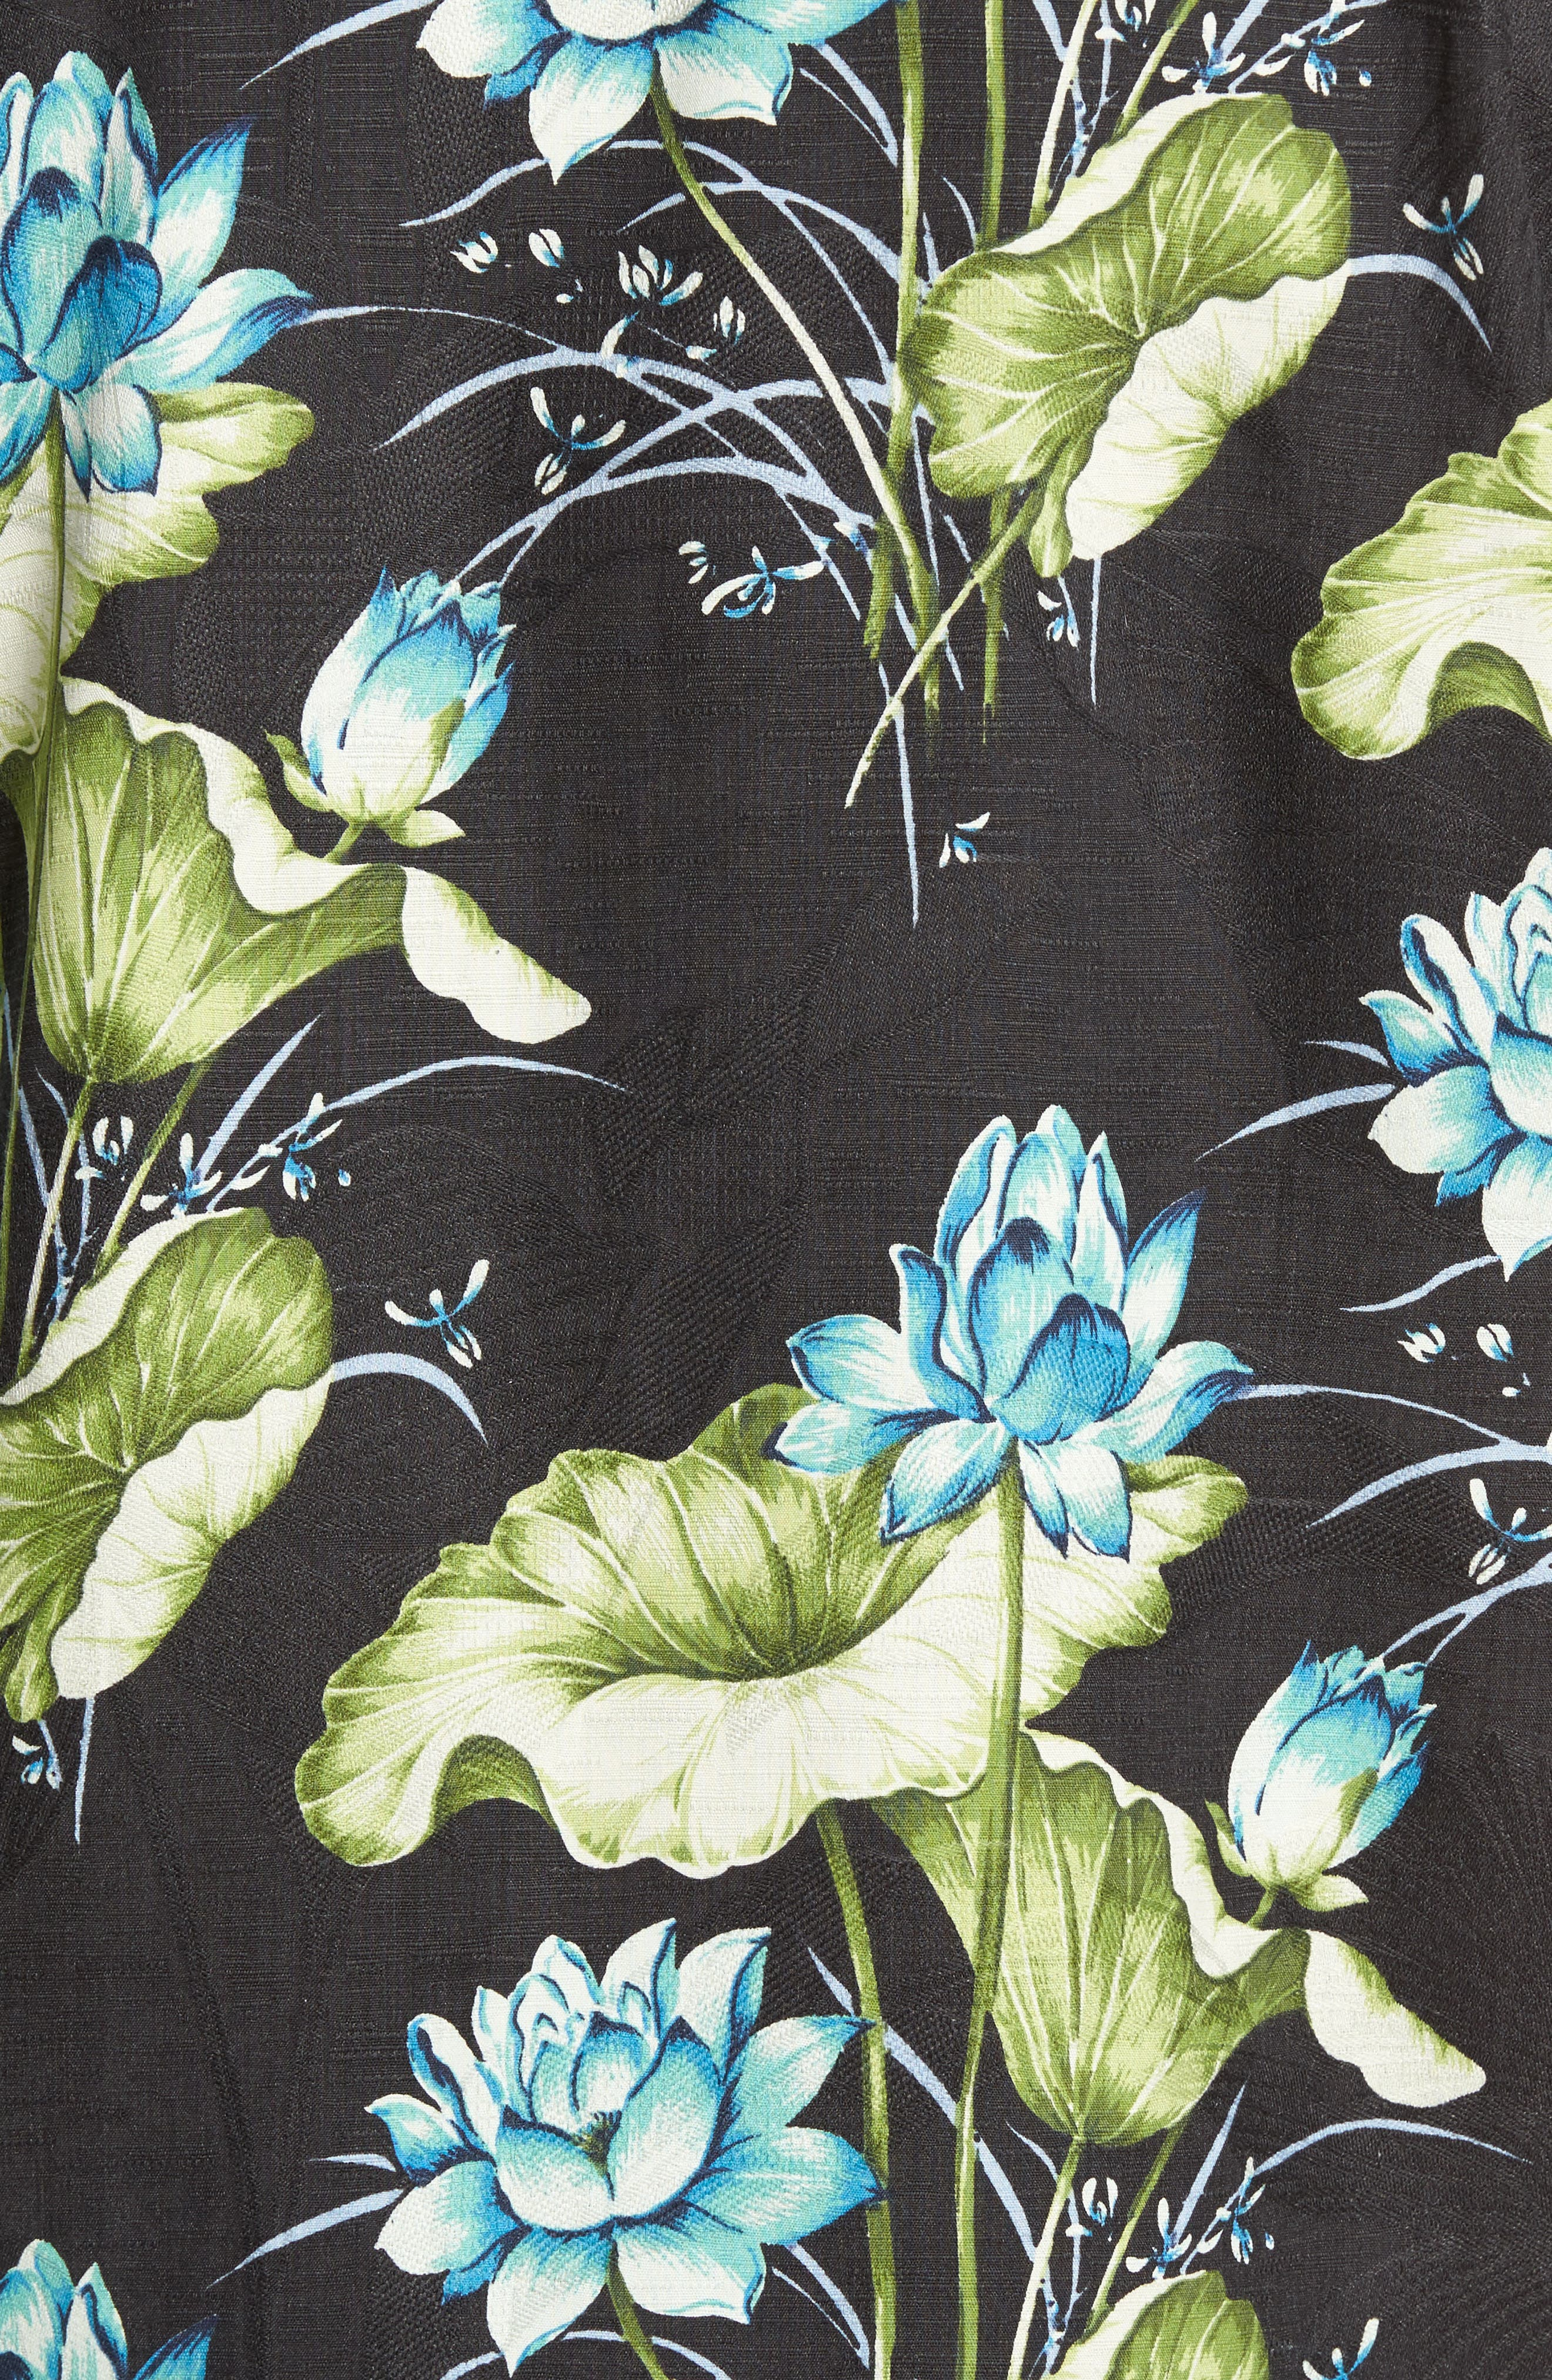 Adriatic Garden Silk Blend Camp Shirt,                             Alternate thumbnail 5, color,                             021